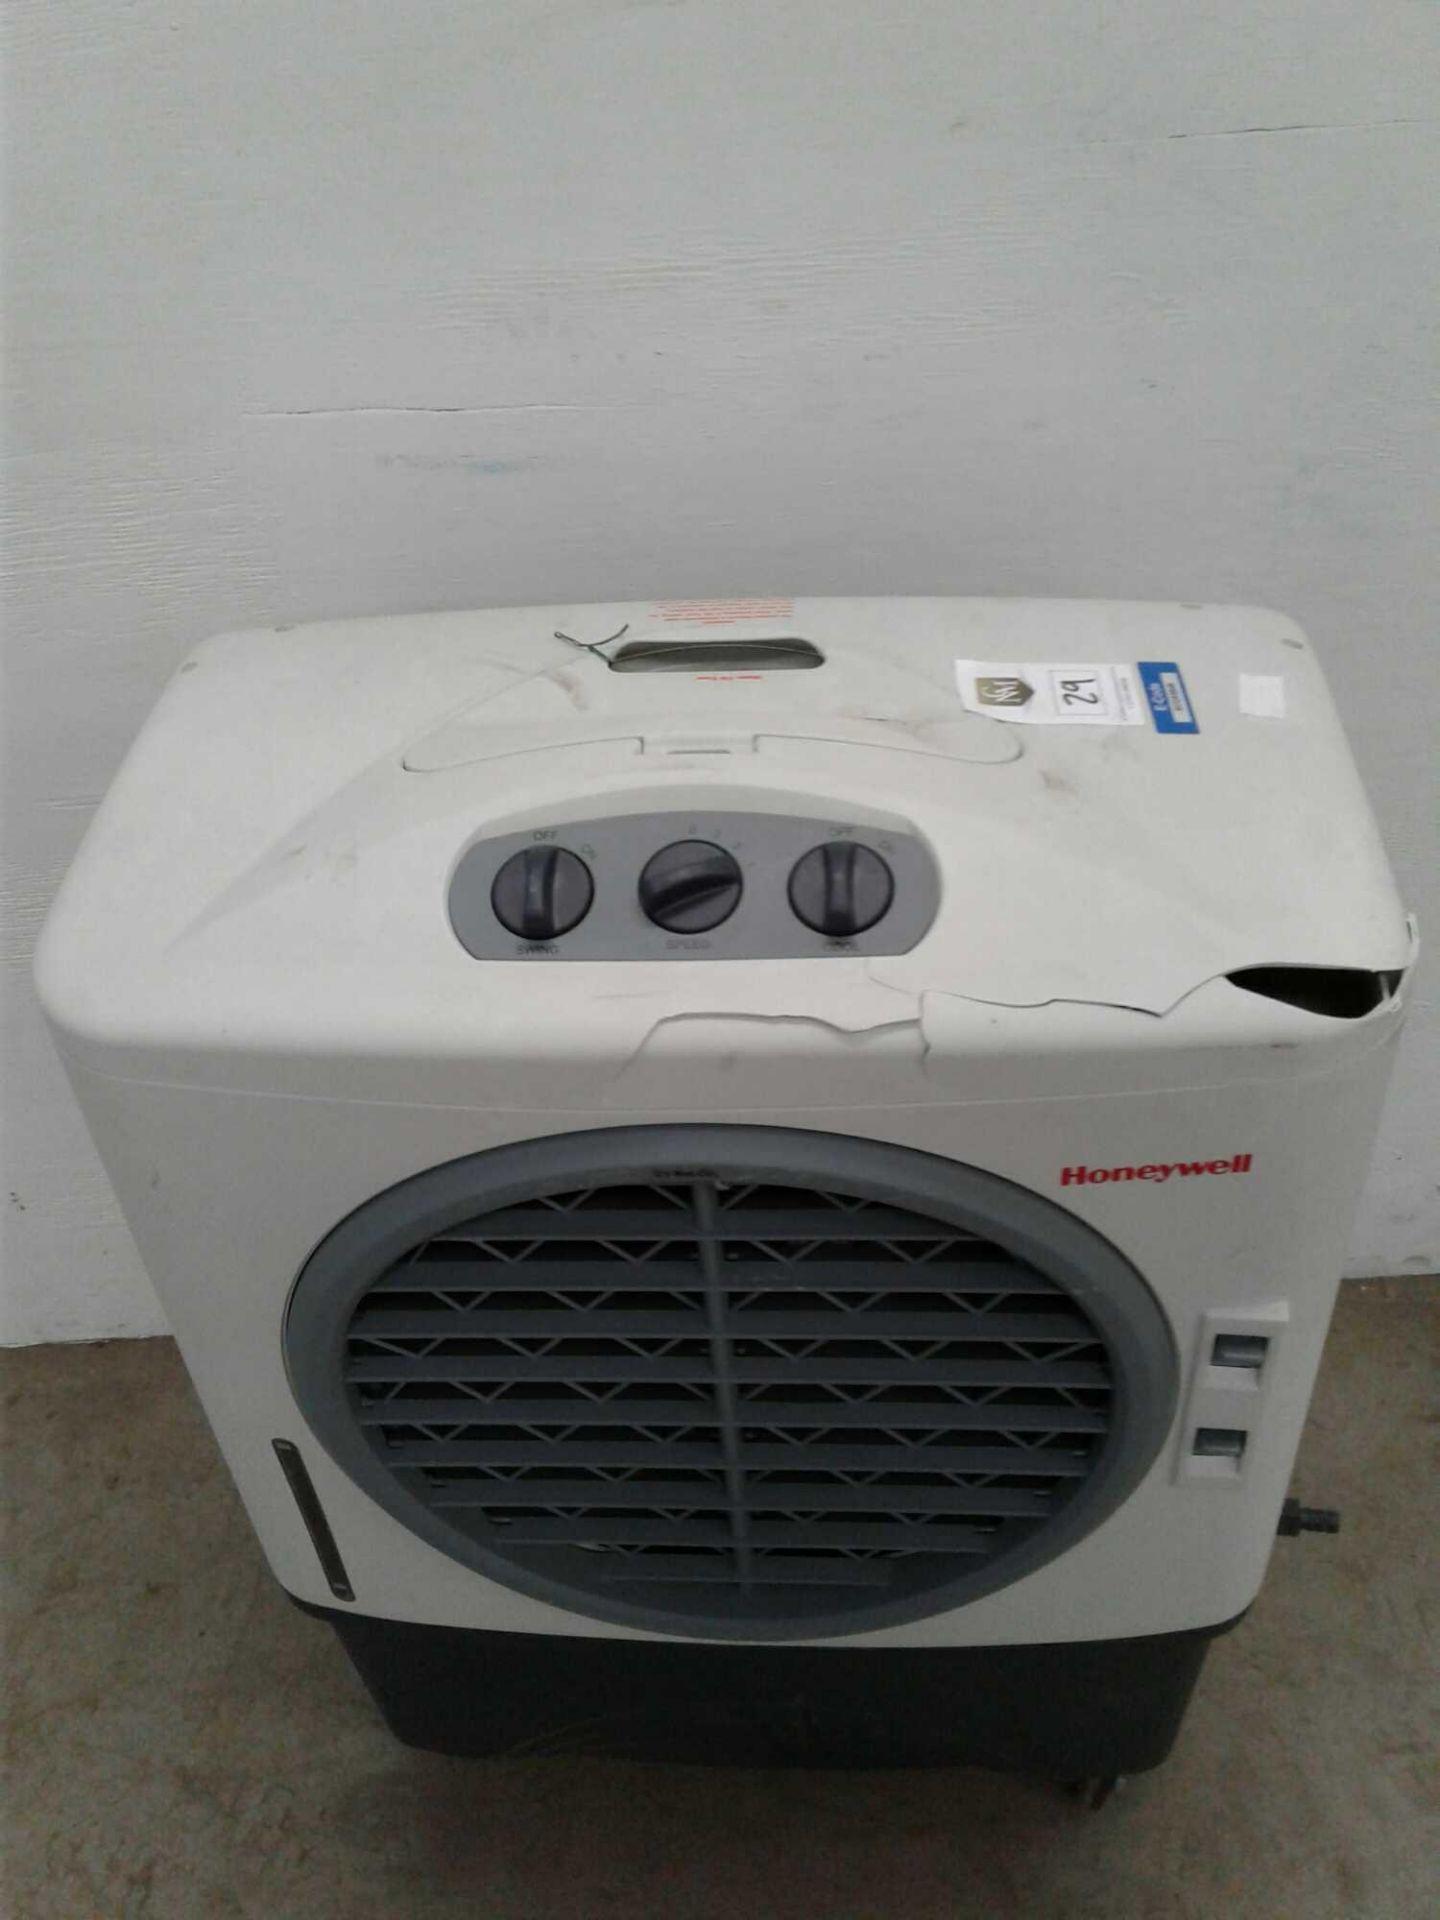 Lot 29 - Honeywell air conditioning unit 230 V